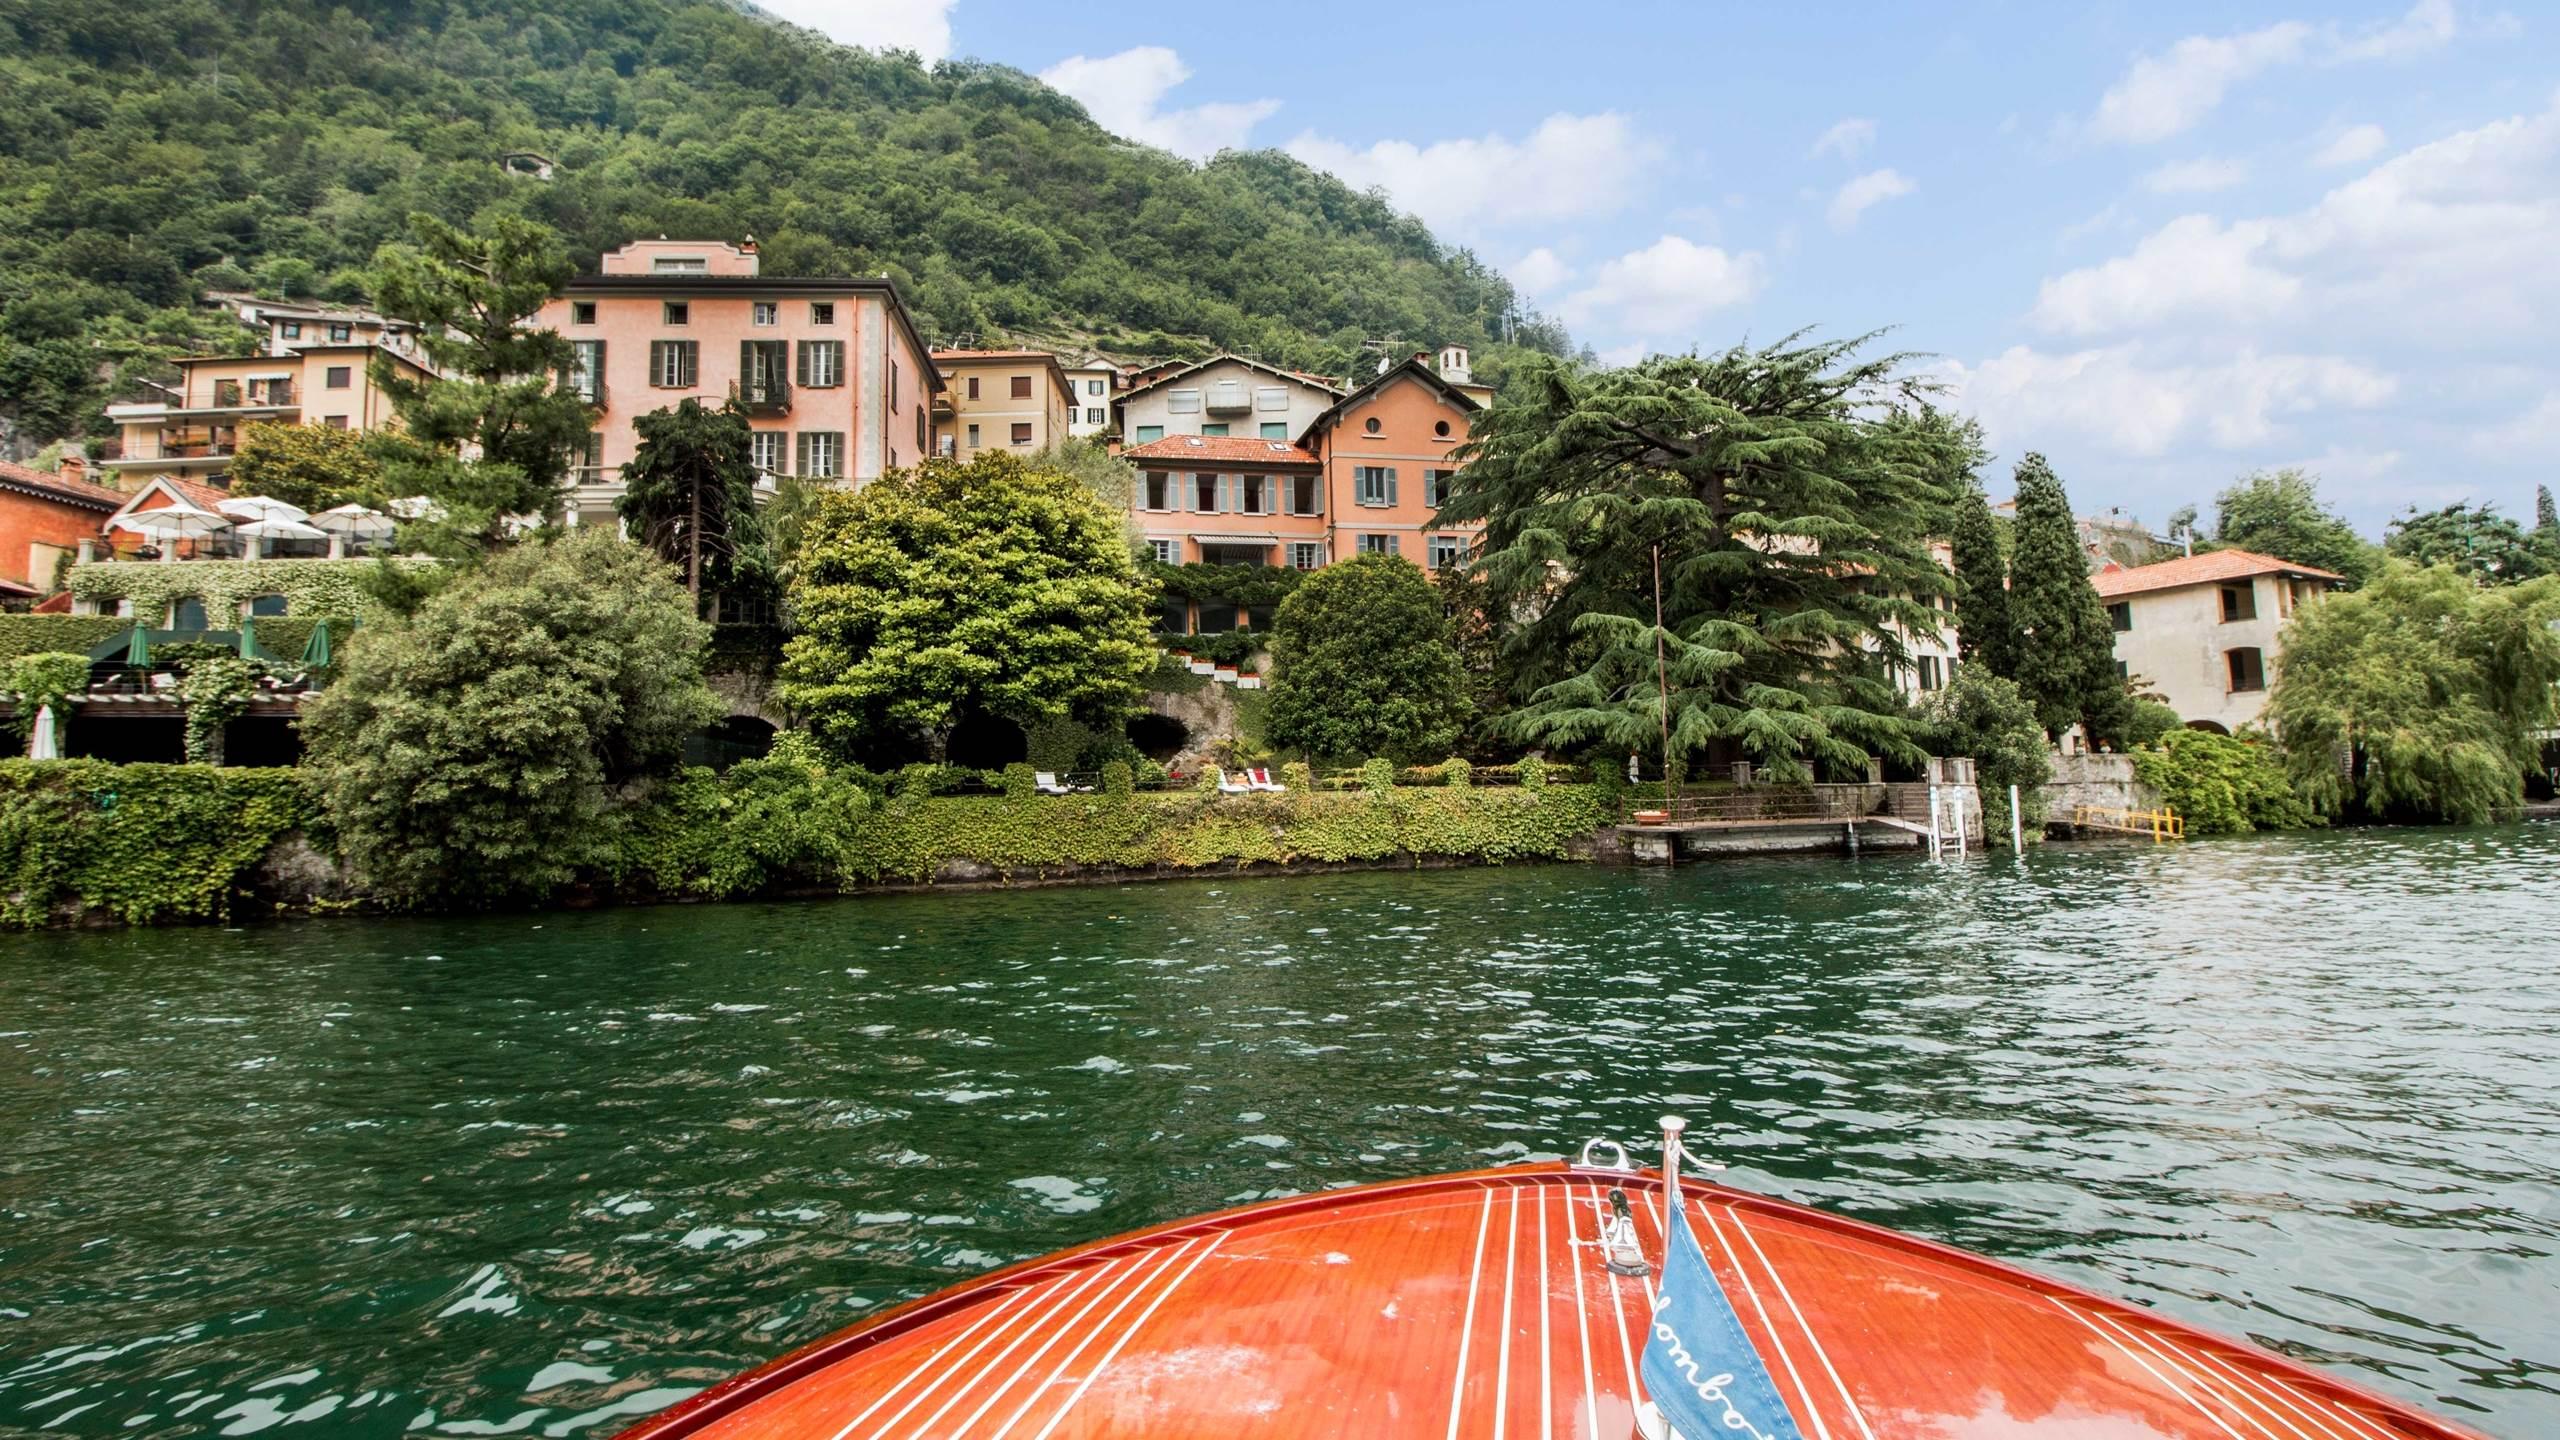 Villa Affaccio A Amp K Villas